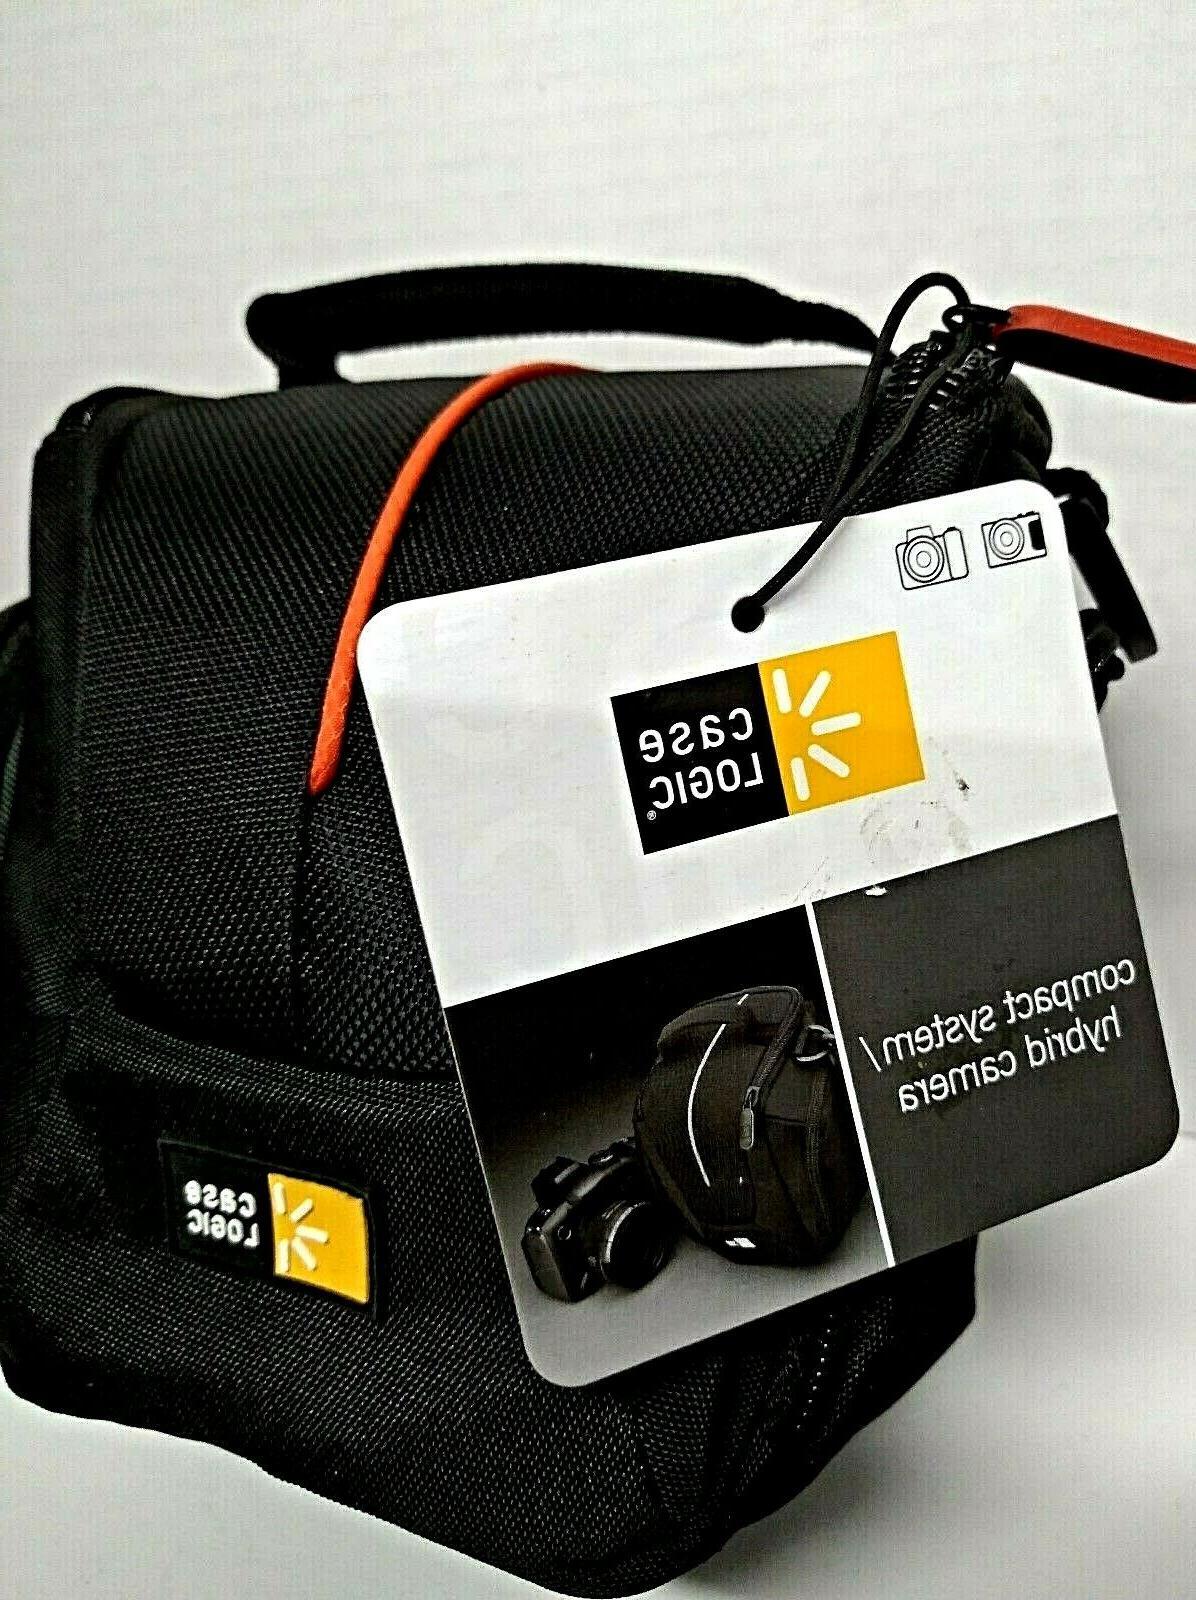 new dcb 304 compact system hybrid camera